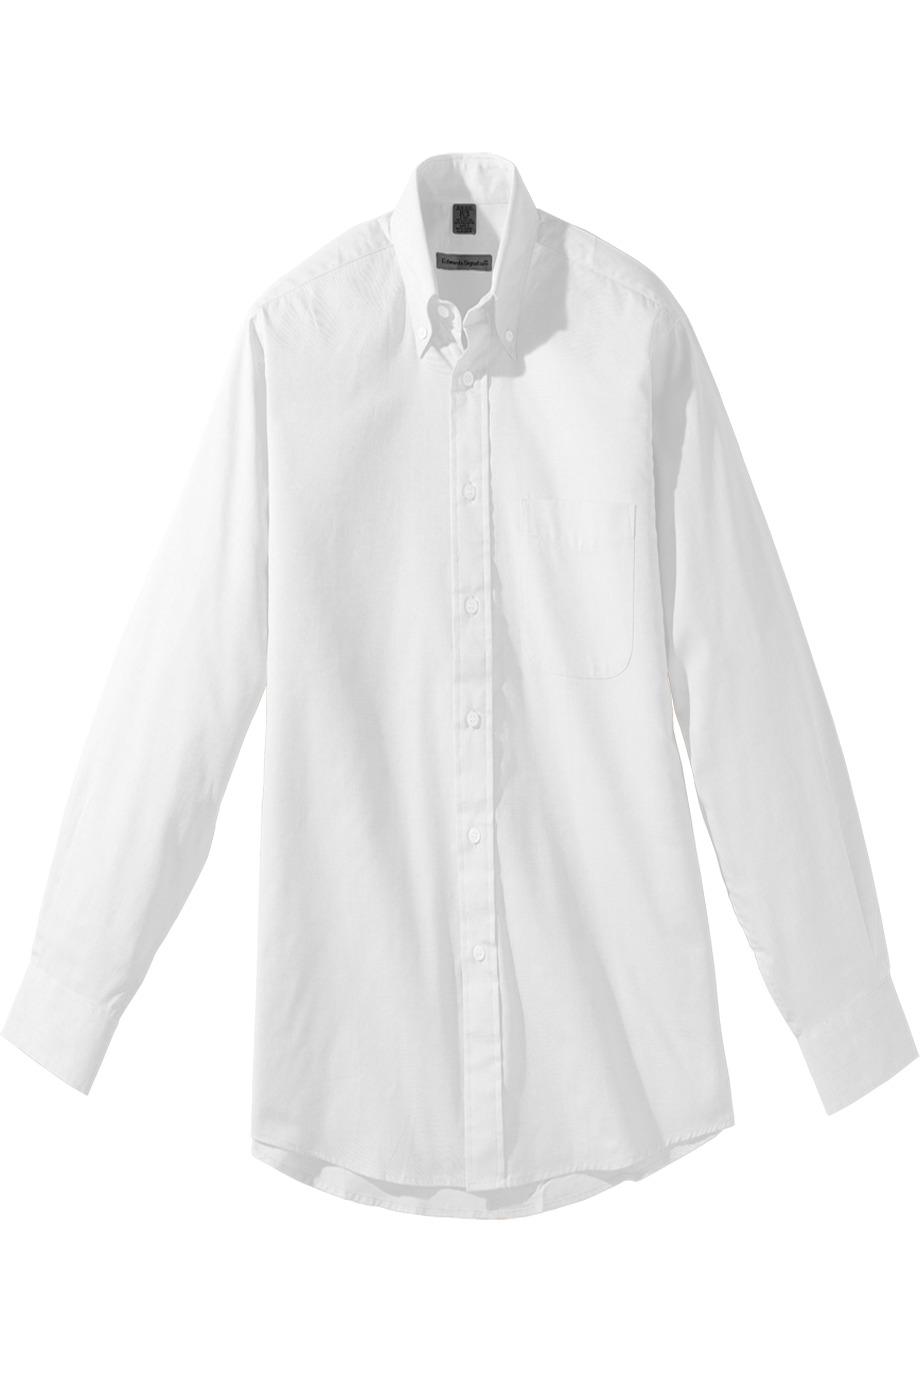 Edwards Garment 1975 - Men's Long Sleeve Pinpoint Oxford Shirt